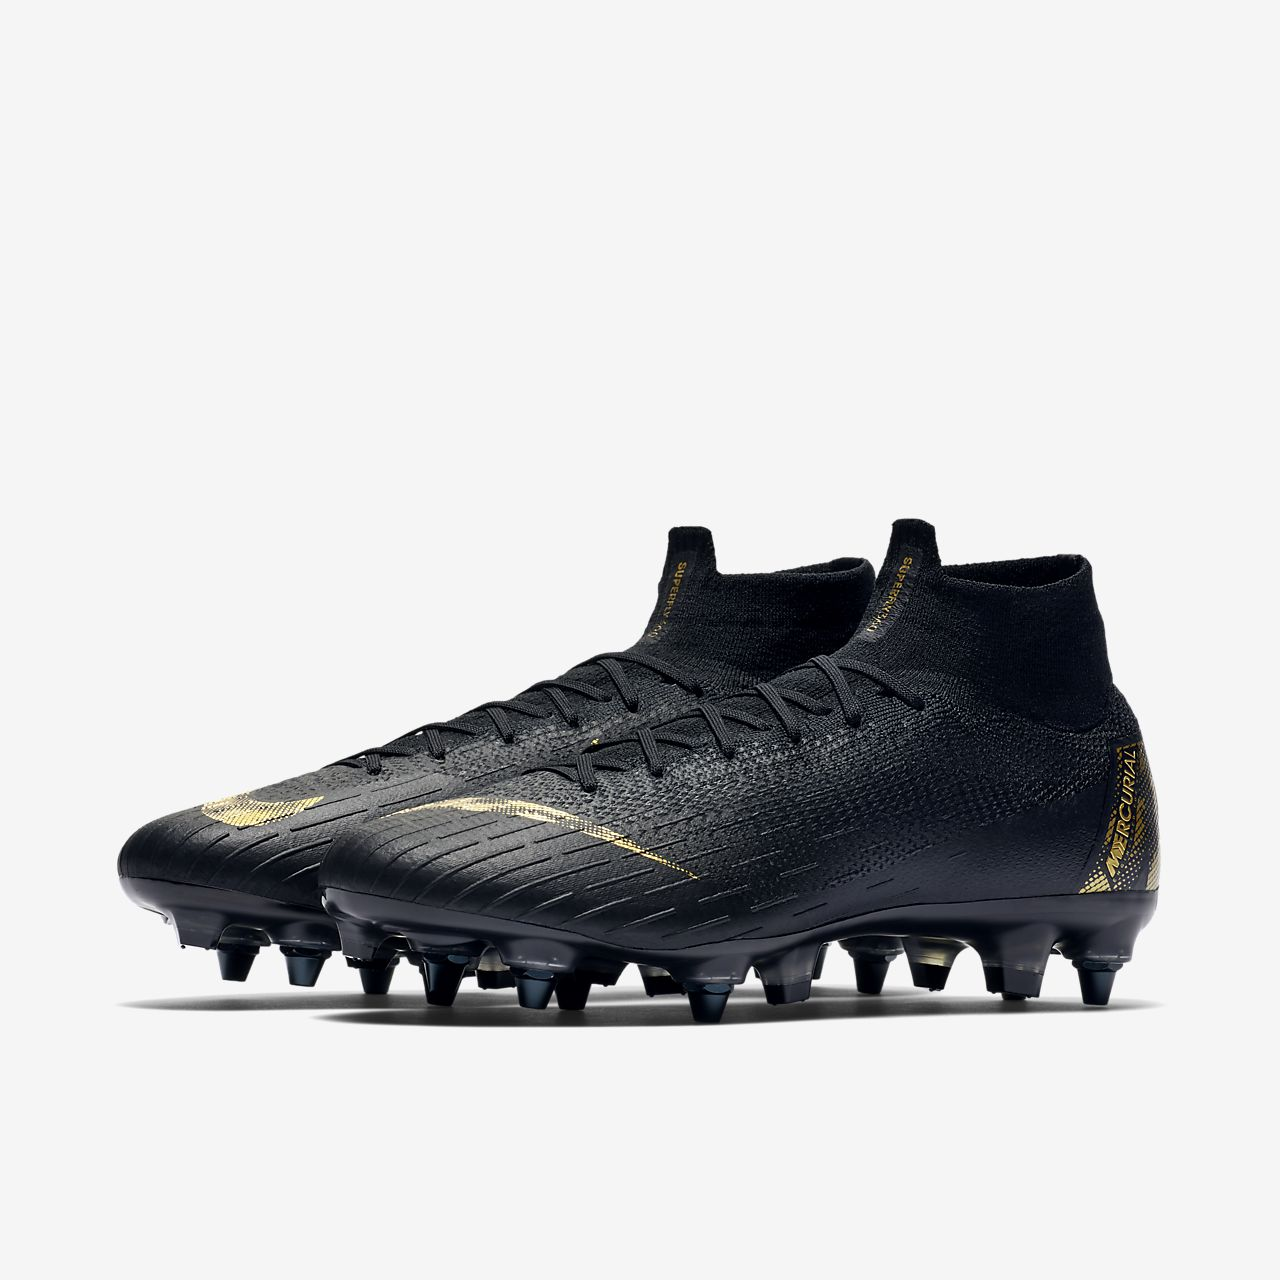 0ff00d6e4021f ... Chuteiras de futebol para terreno mole Nike Mercurial Superfly 360  Elite SG-PRO Anti-